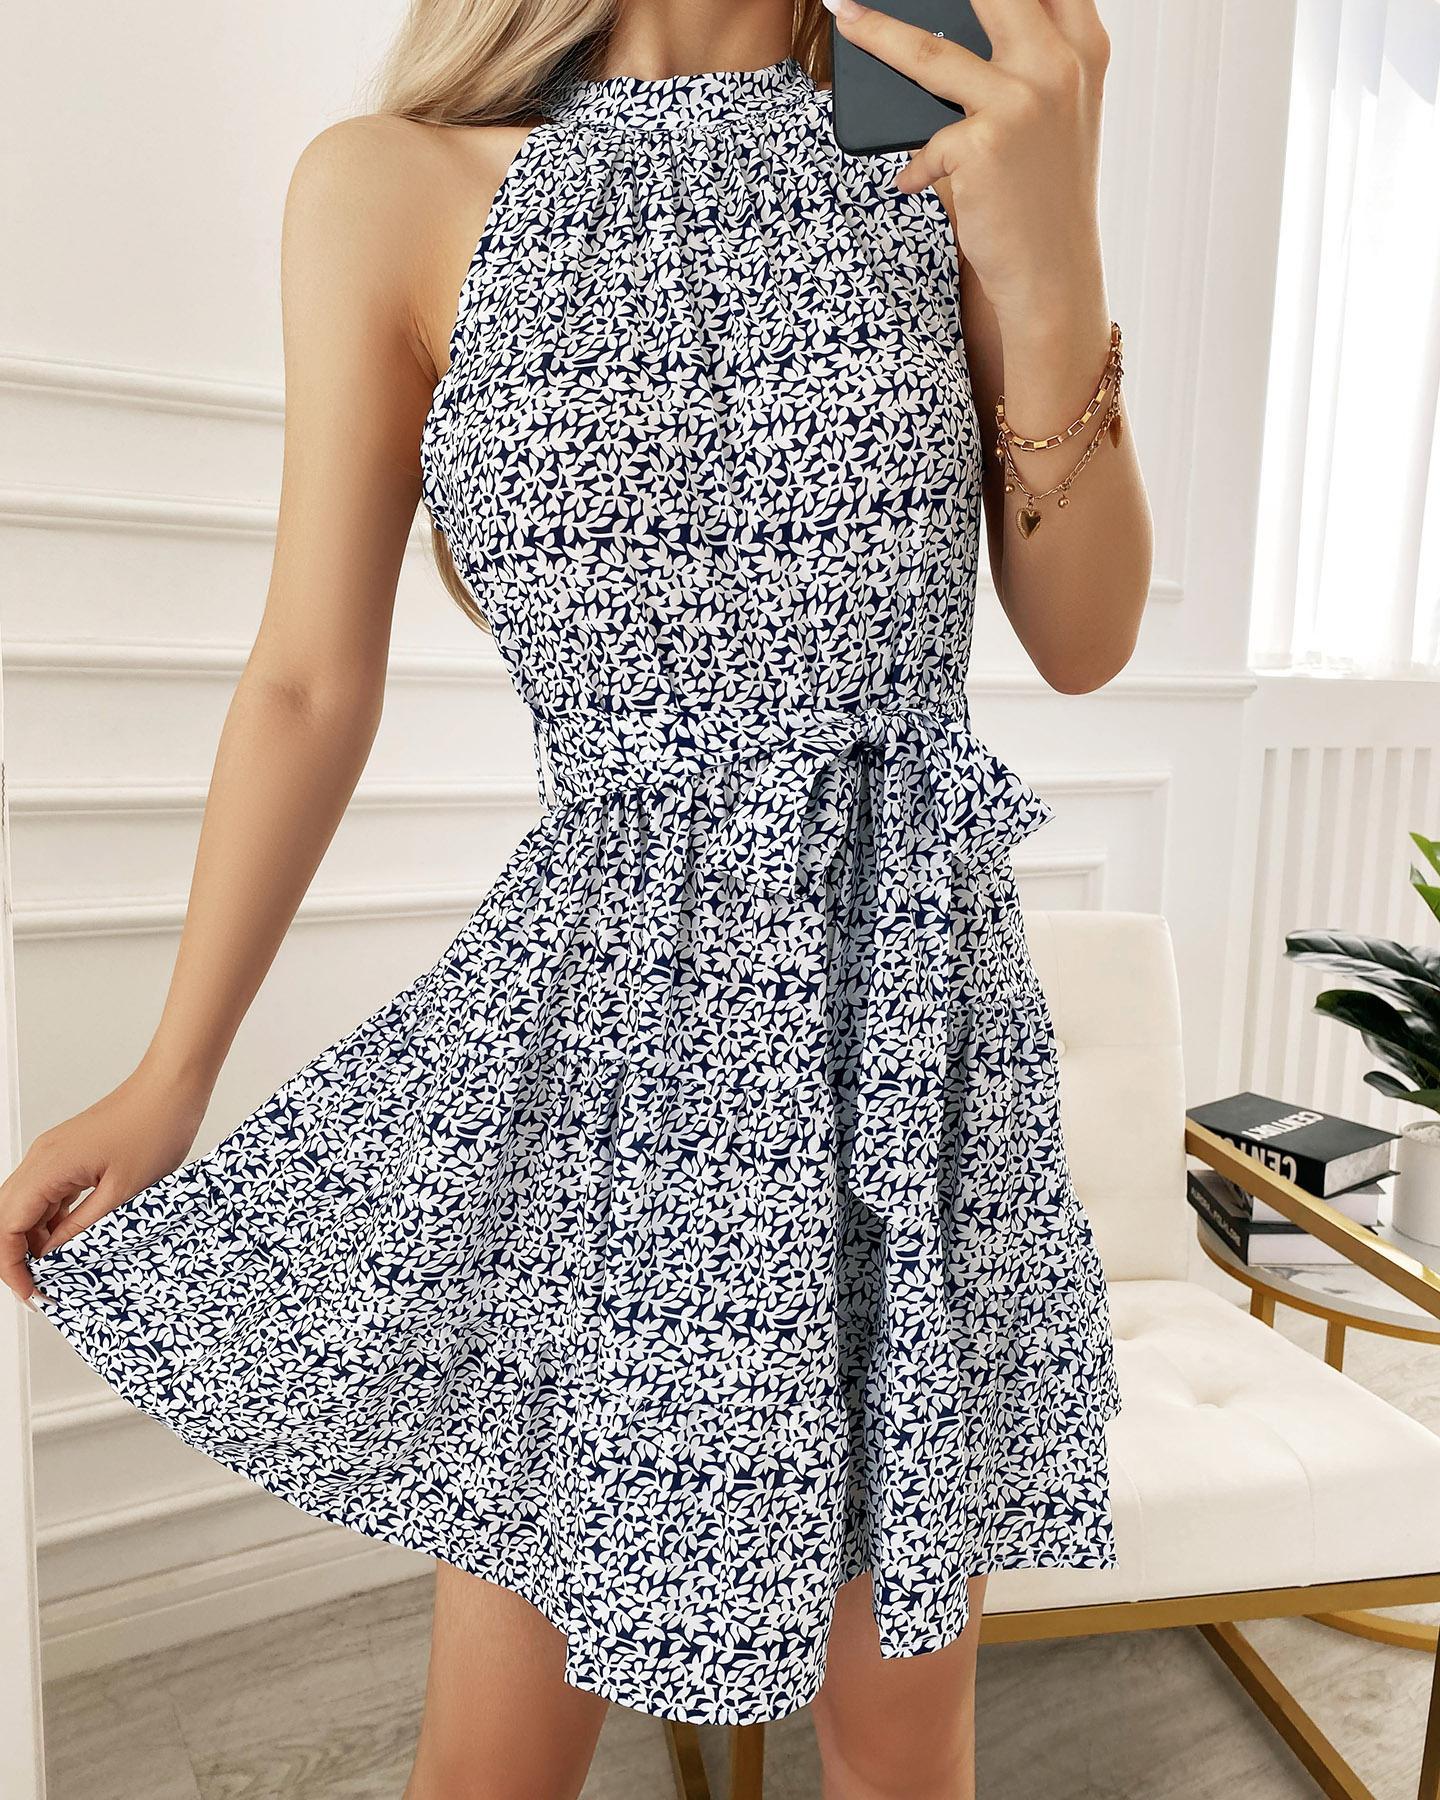 Lace-up Floral Print Sleeveless Pleated Mini Dress